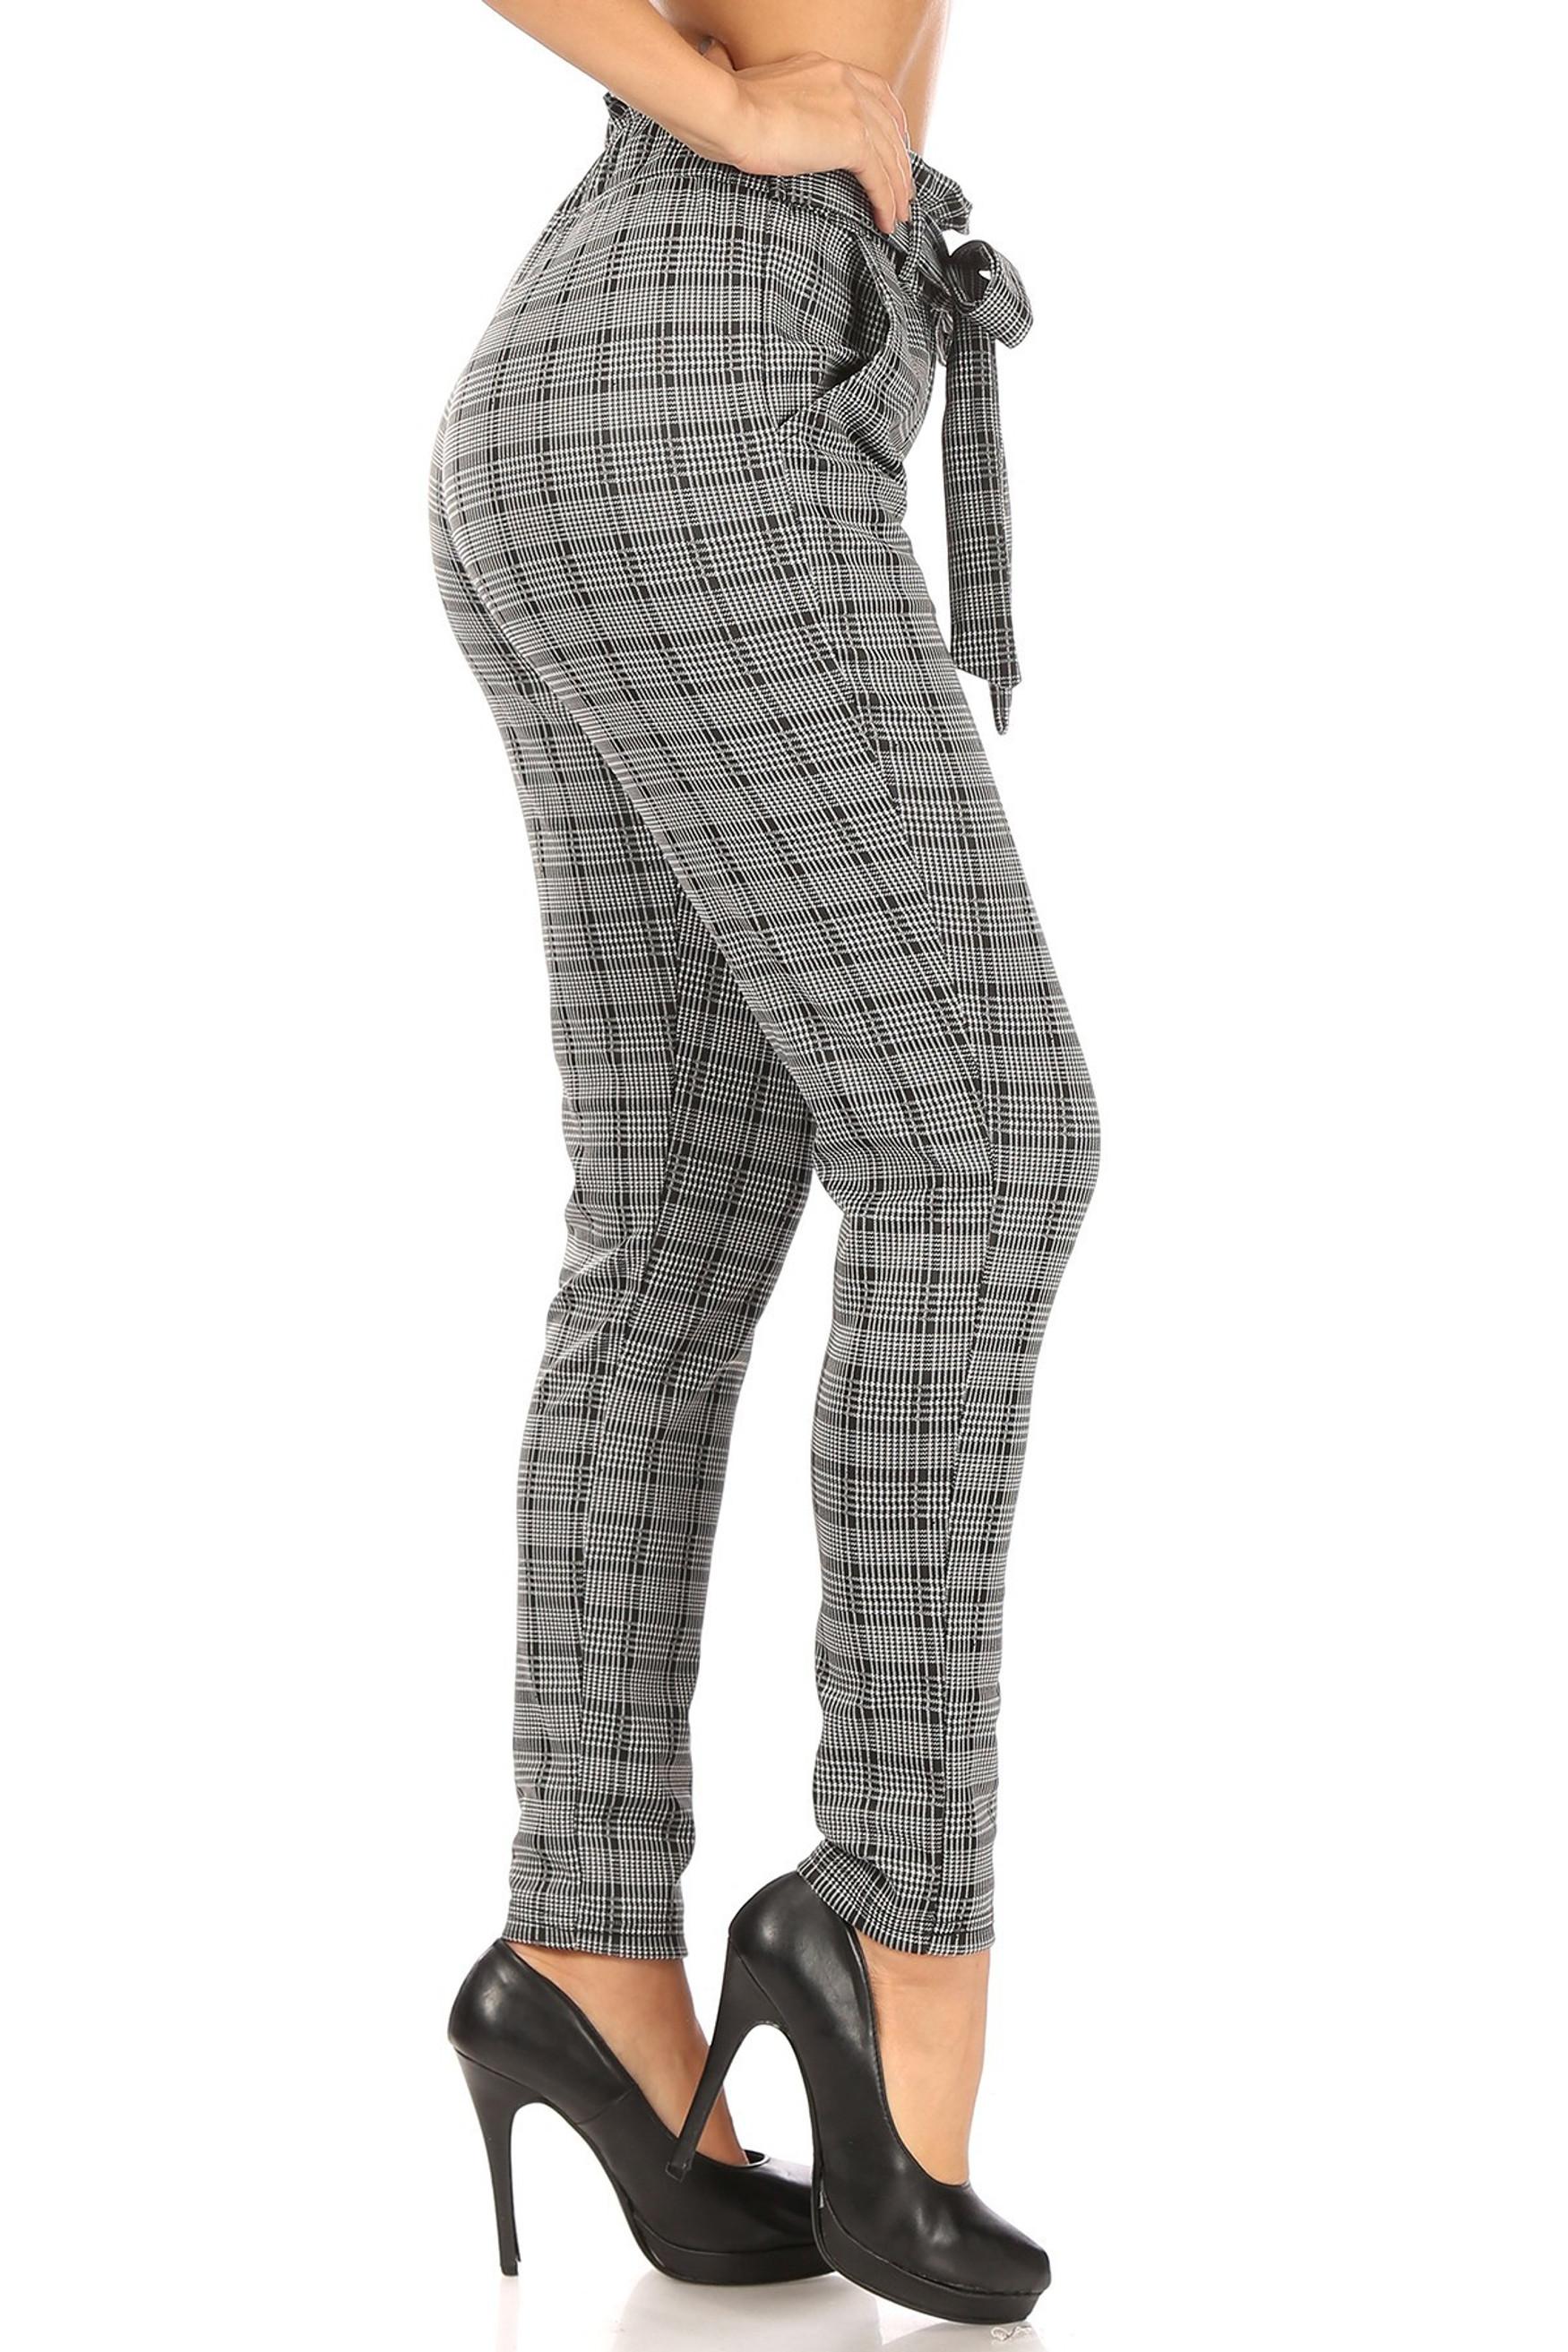 Glen Plaid High Waisted Paper Bag Tie Front Pants